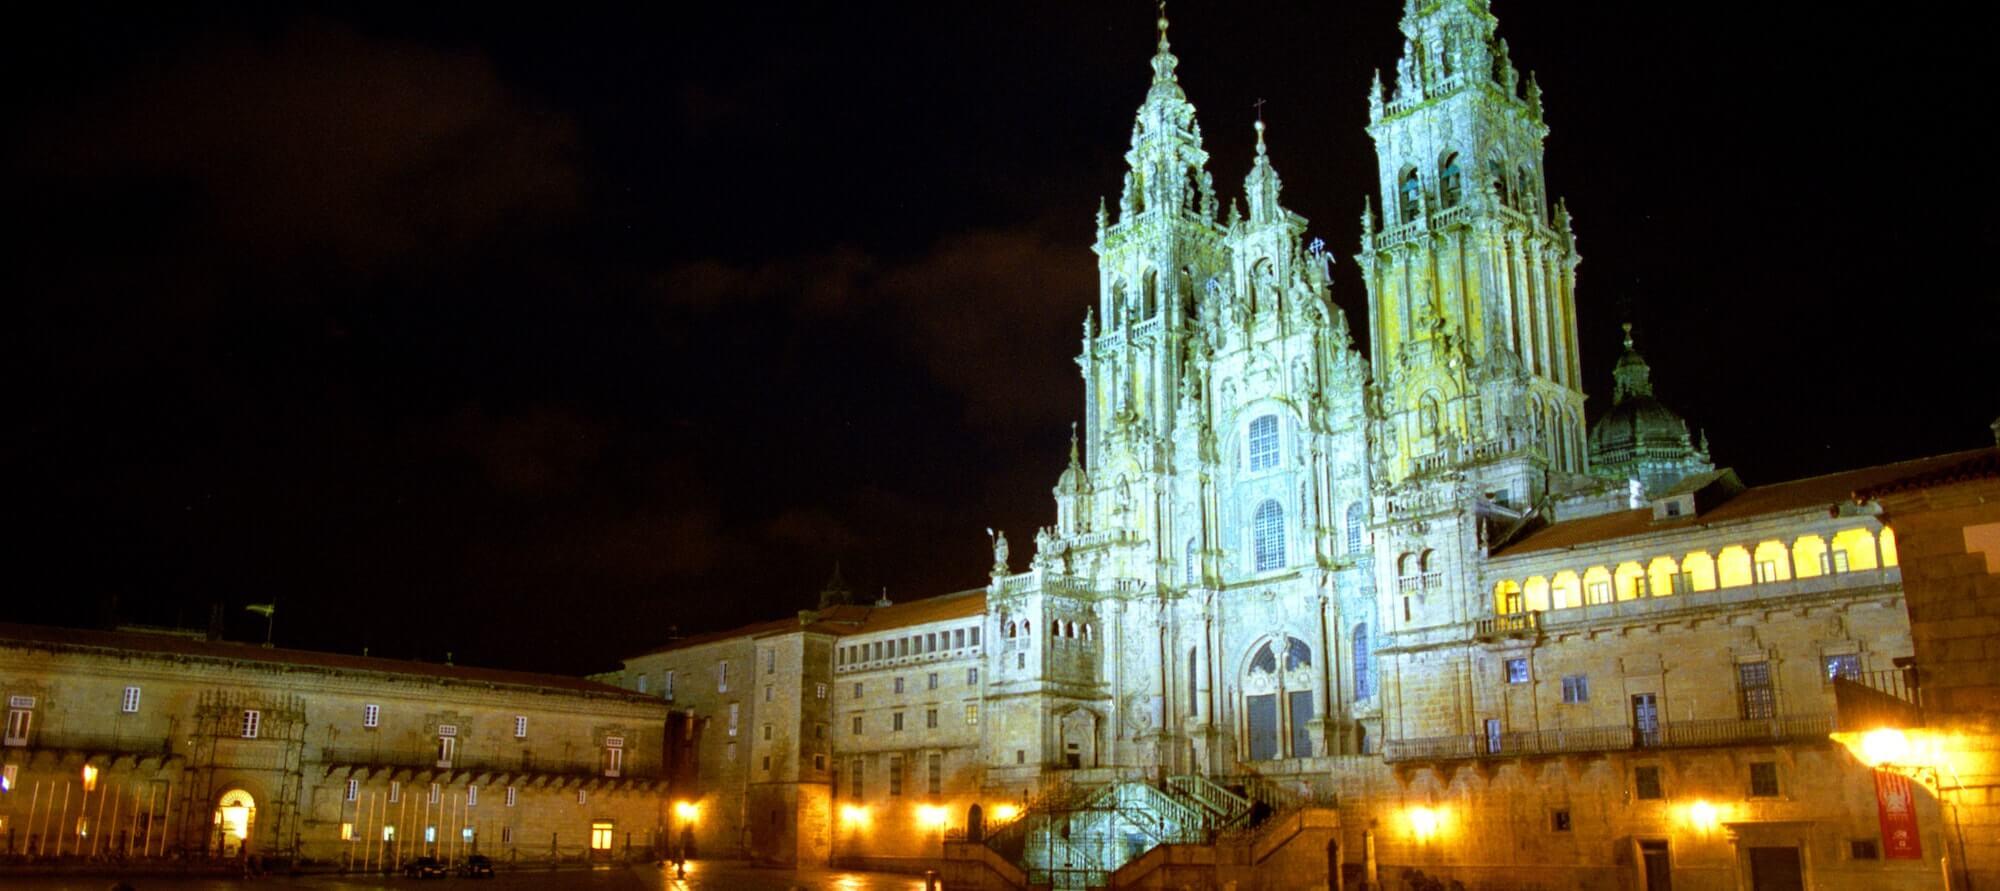 mineria-de-galicia-catedral-santiago-09-slide-min